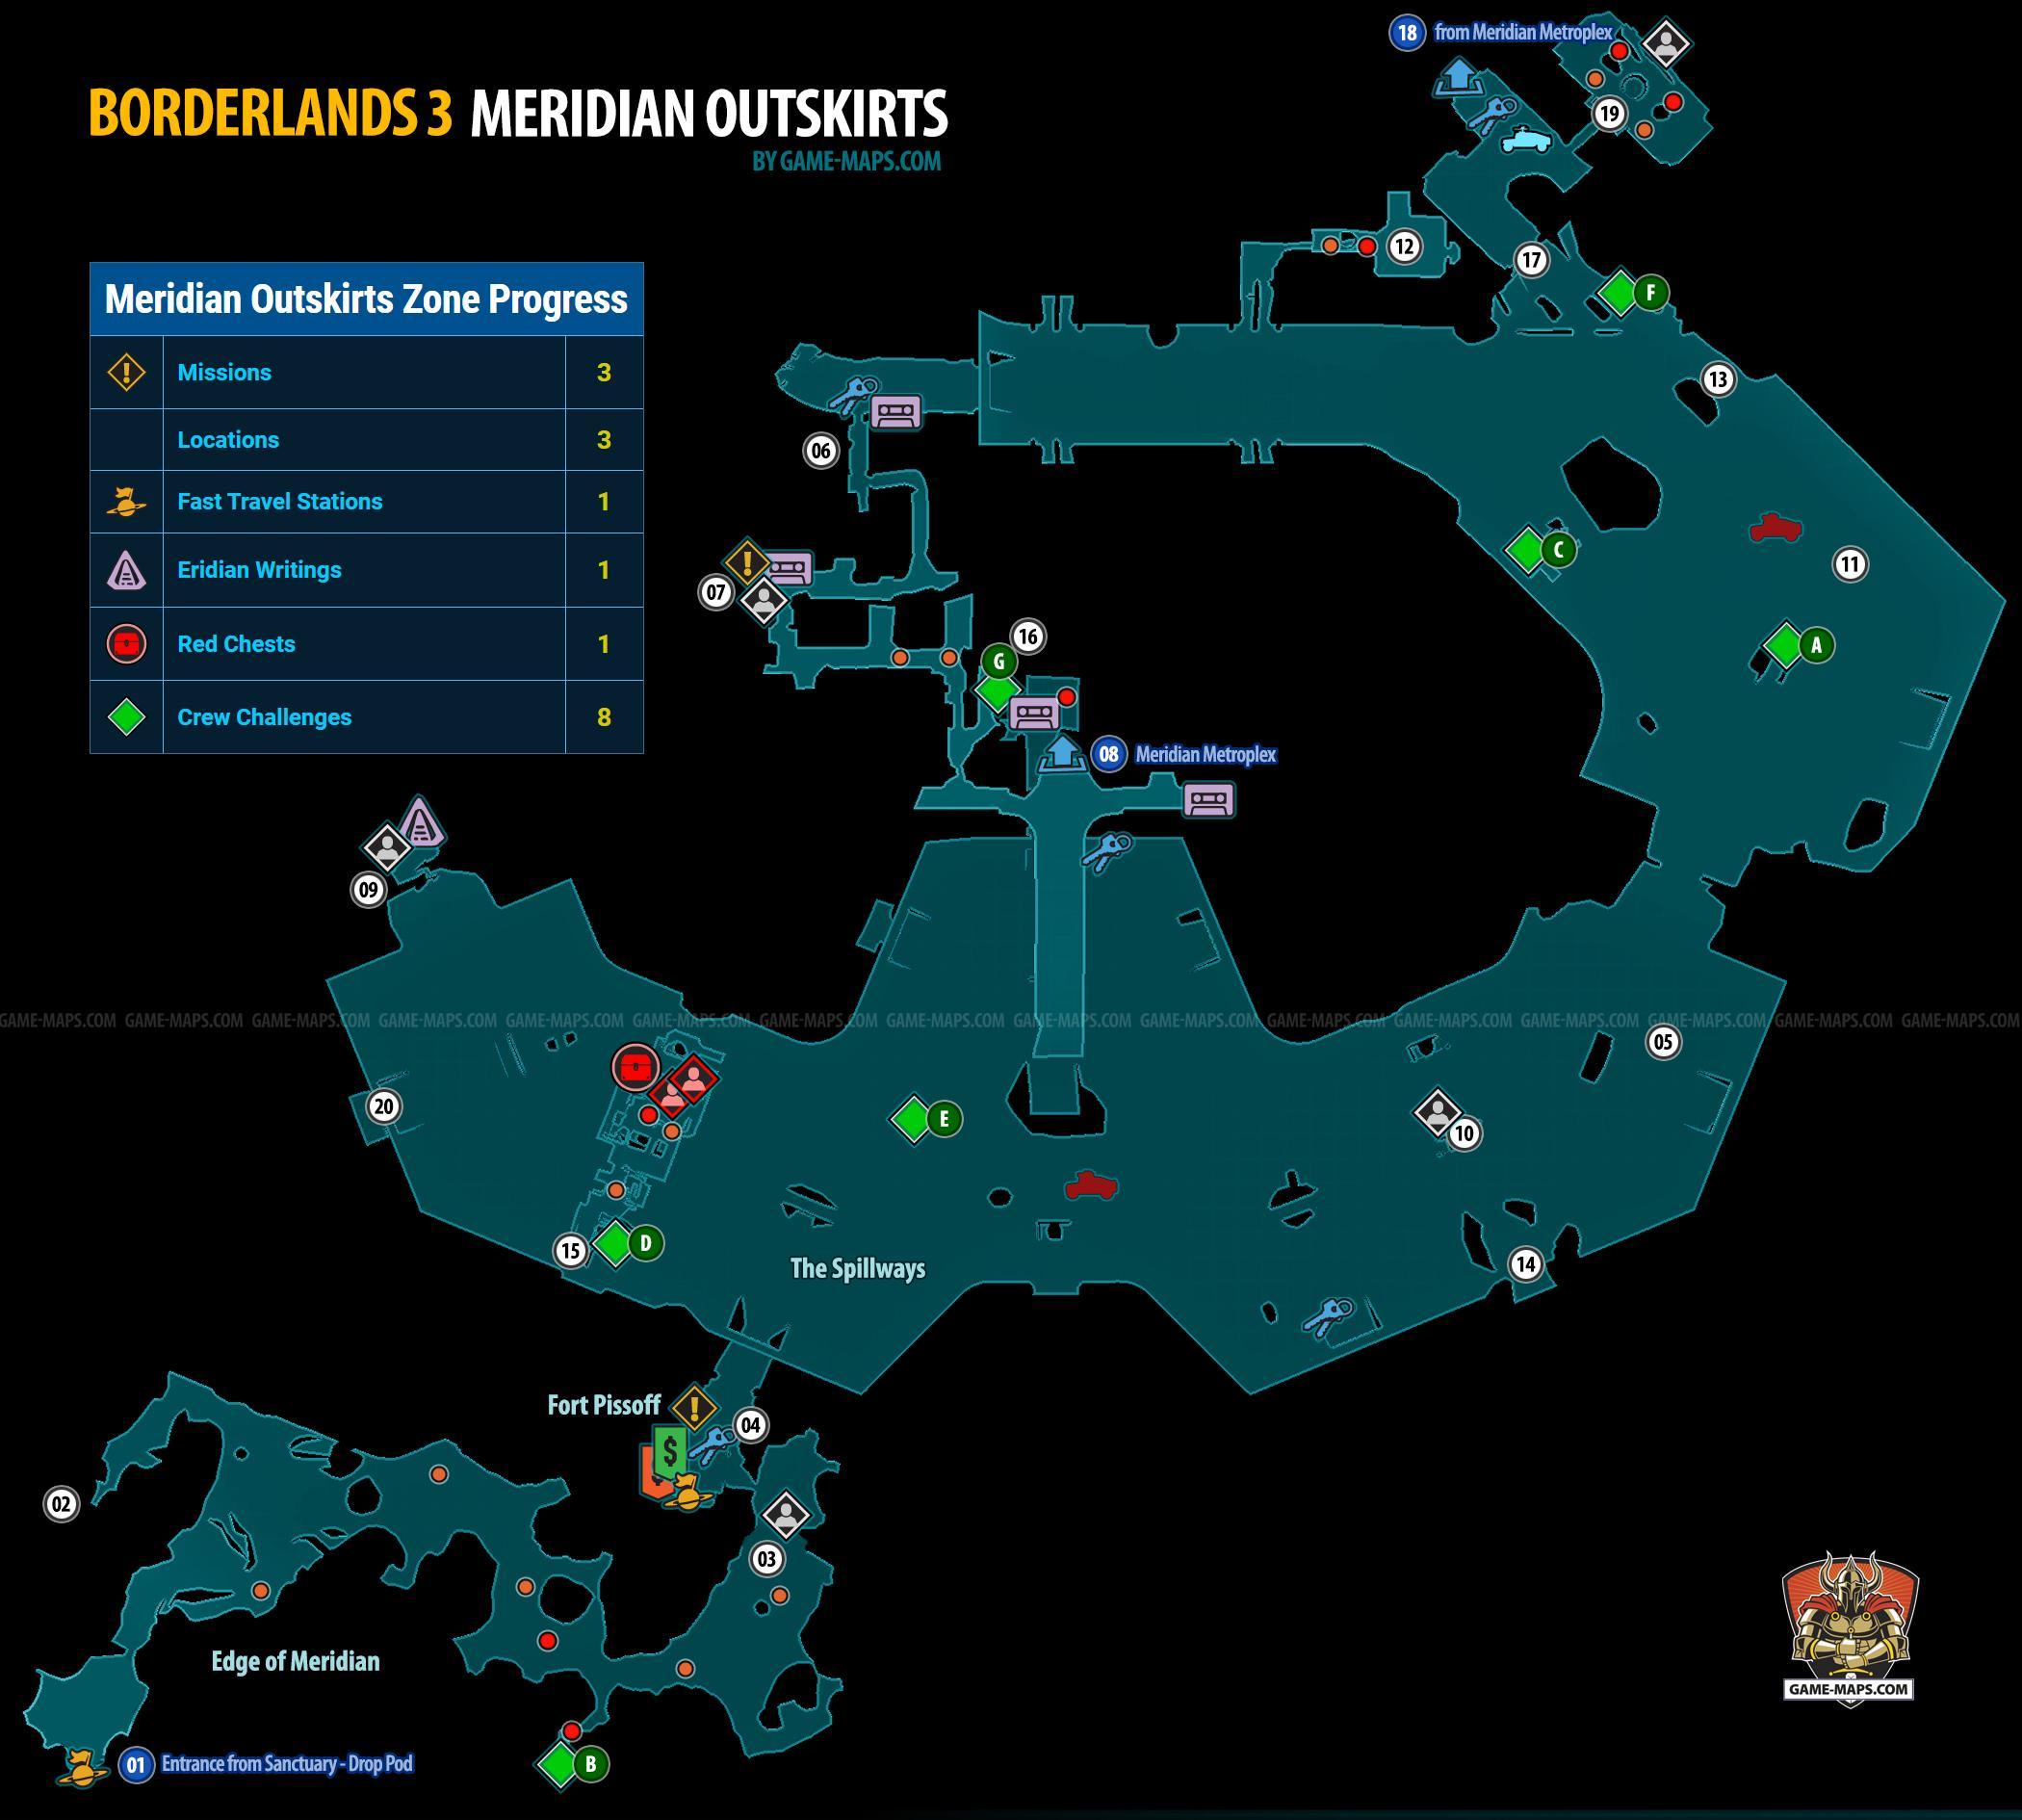 Meridian Outskirts Map for Borderlands 3 | game-maps com